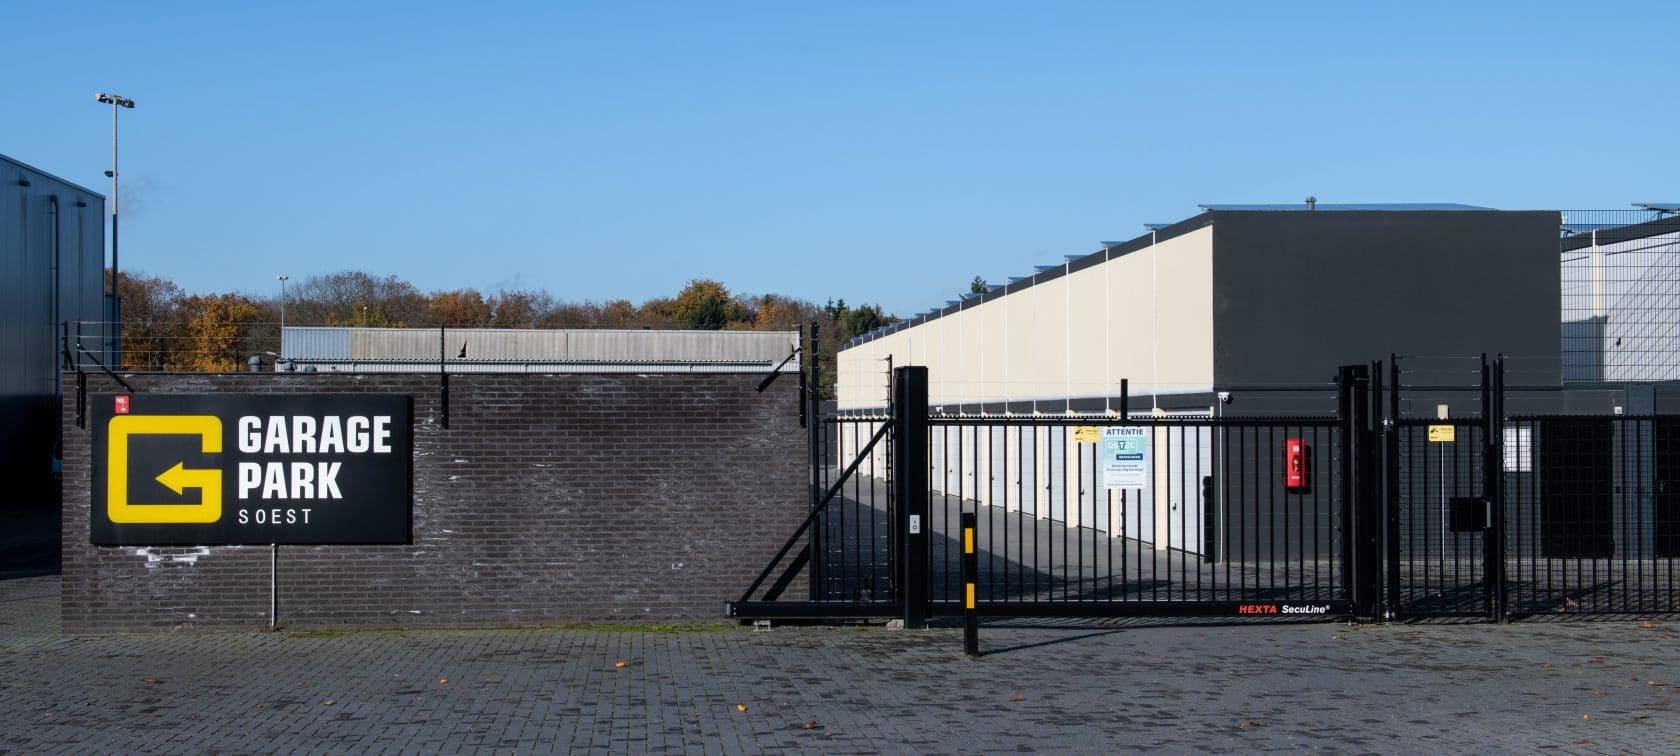 GaragePark Soest - Garageboxen Soest